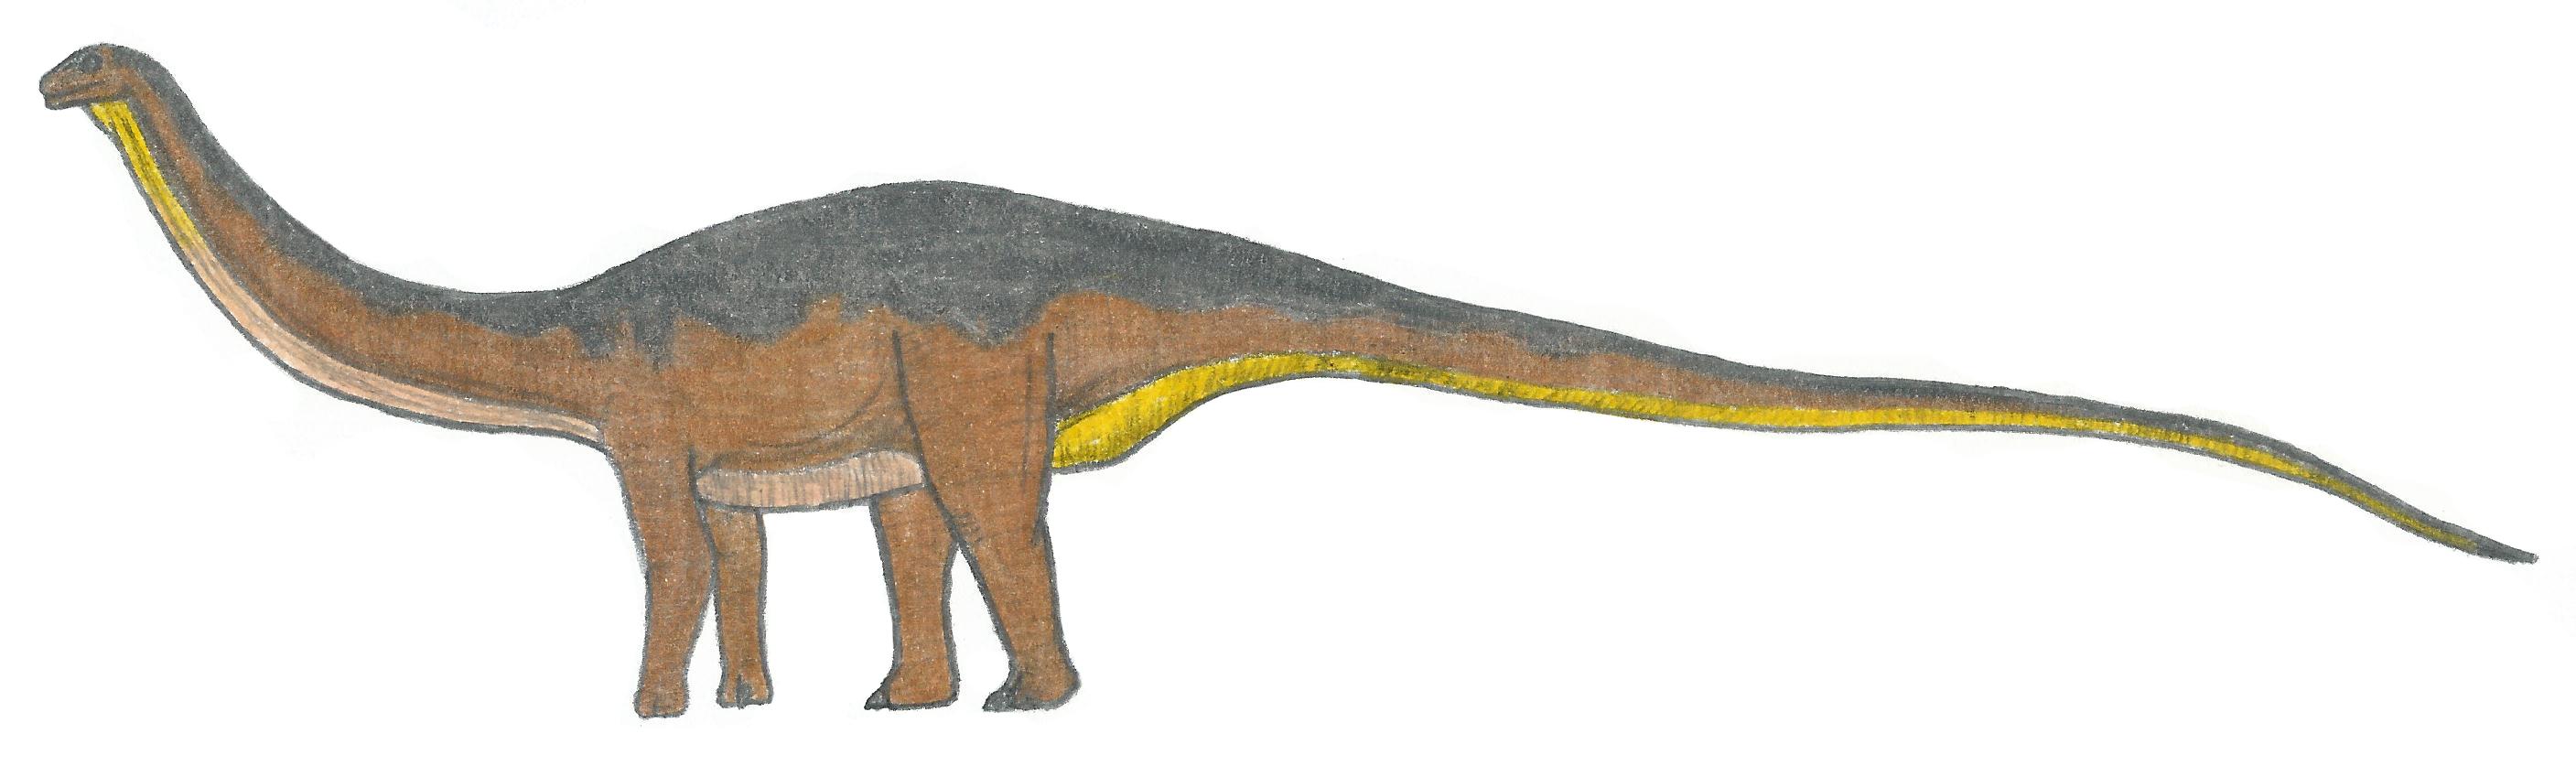 Apatosaurus by Venofoot on DeviantArt